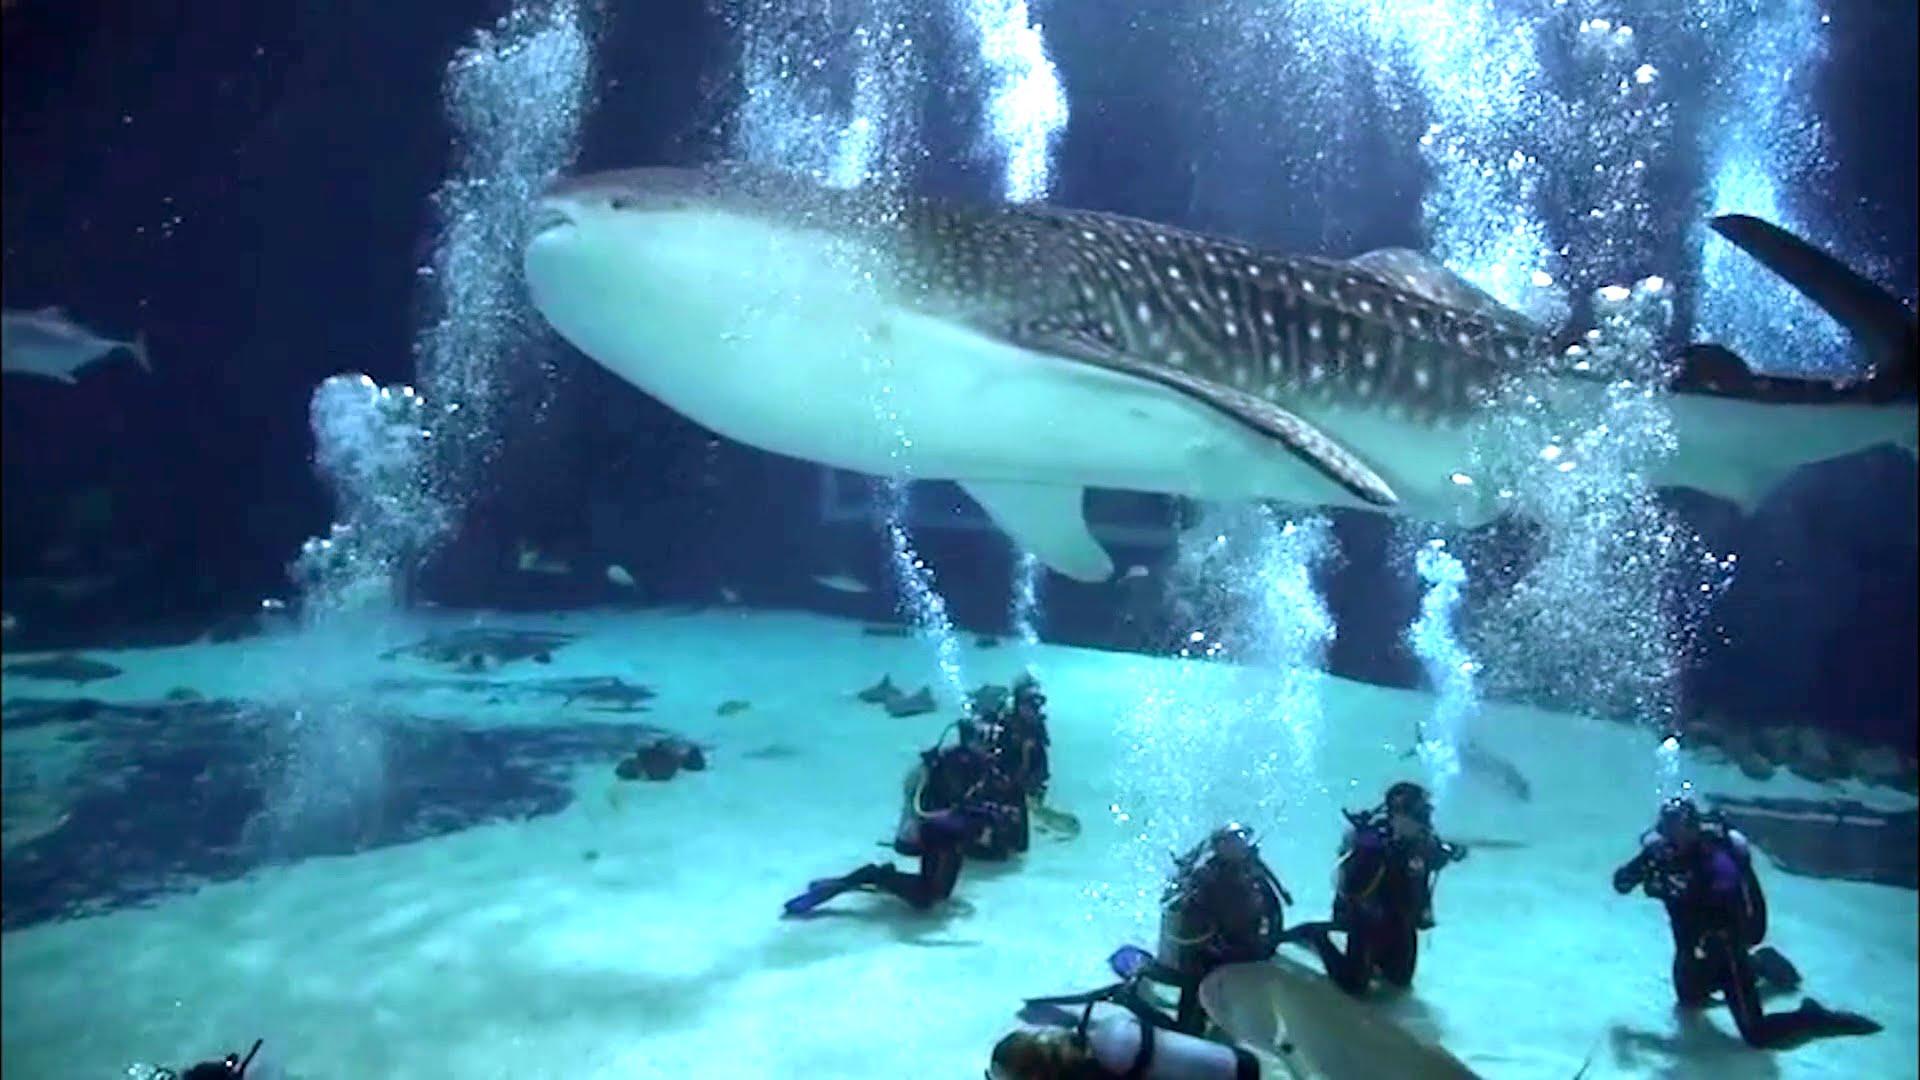 Scuba Diving with Whale Sharks - Georgia Aquarium - YouTube